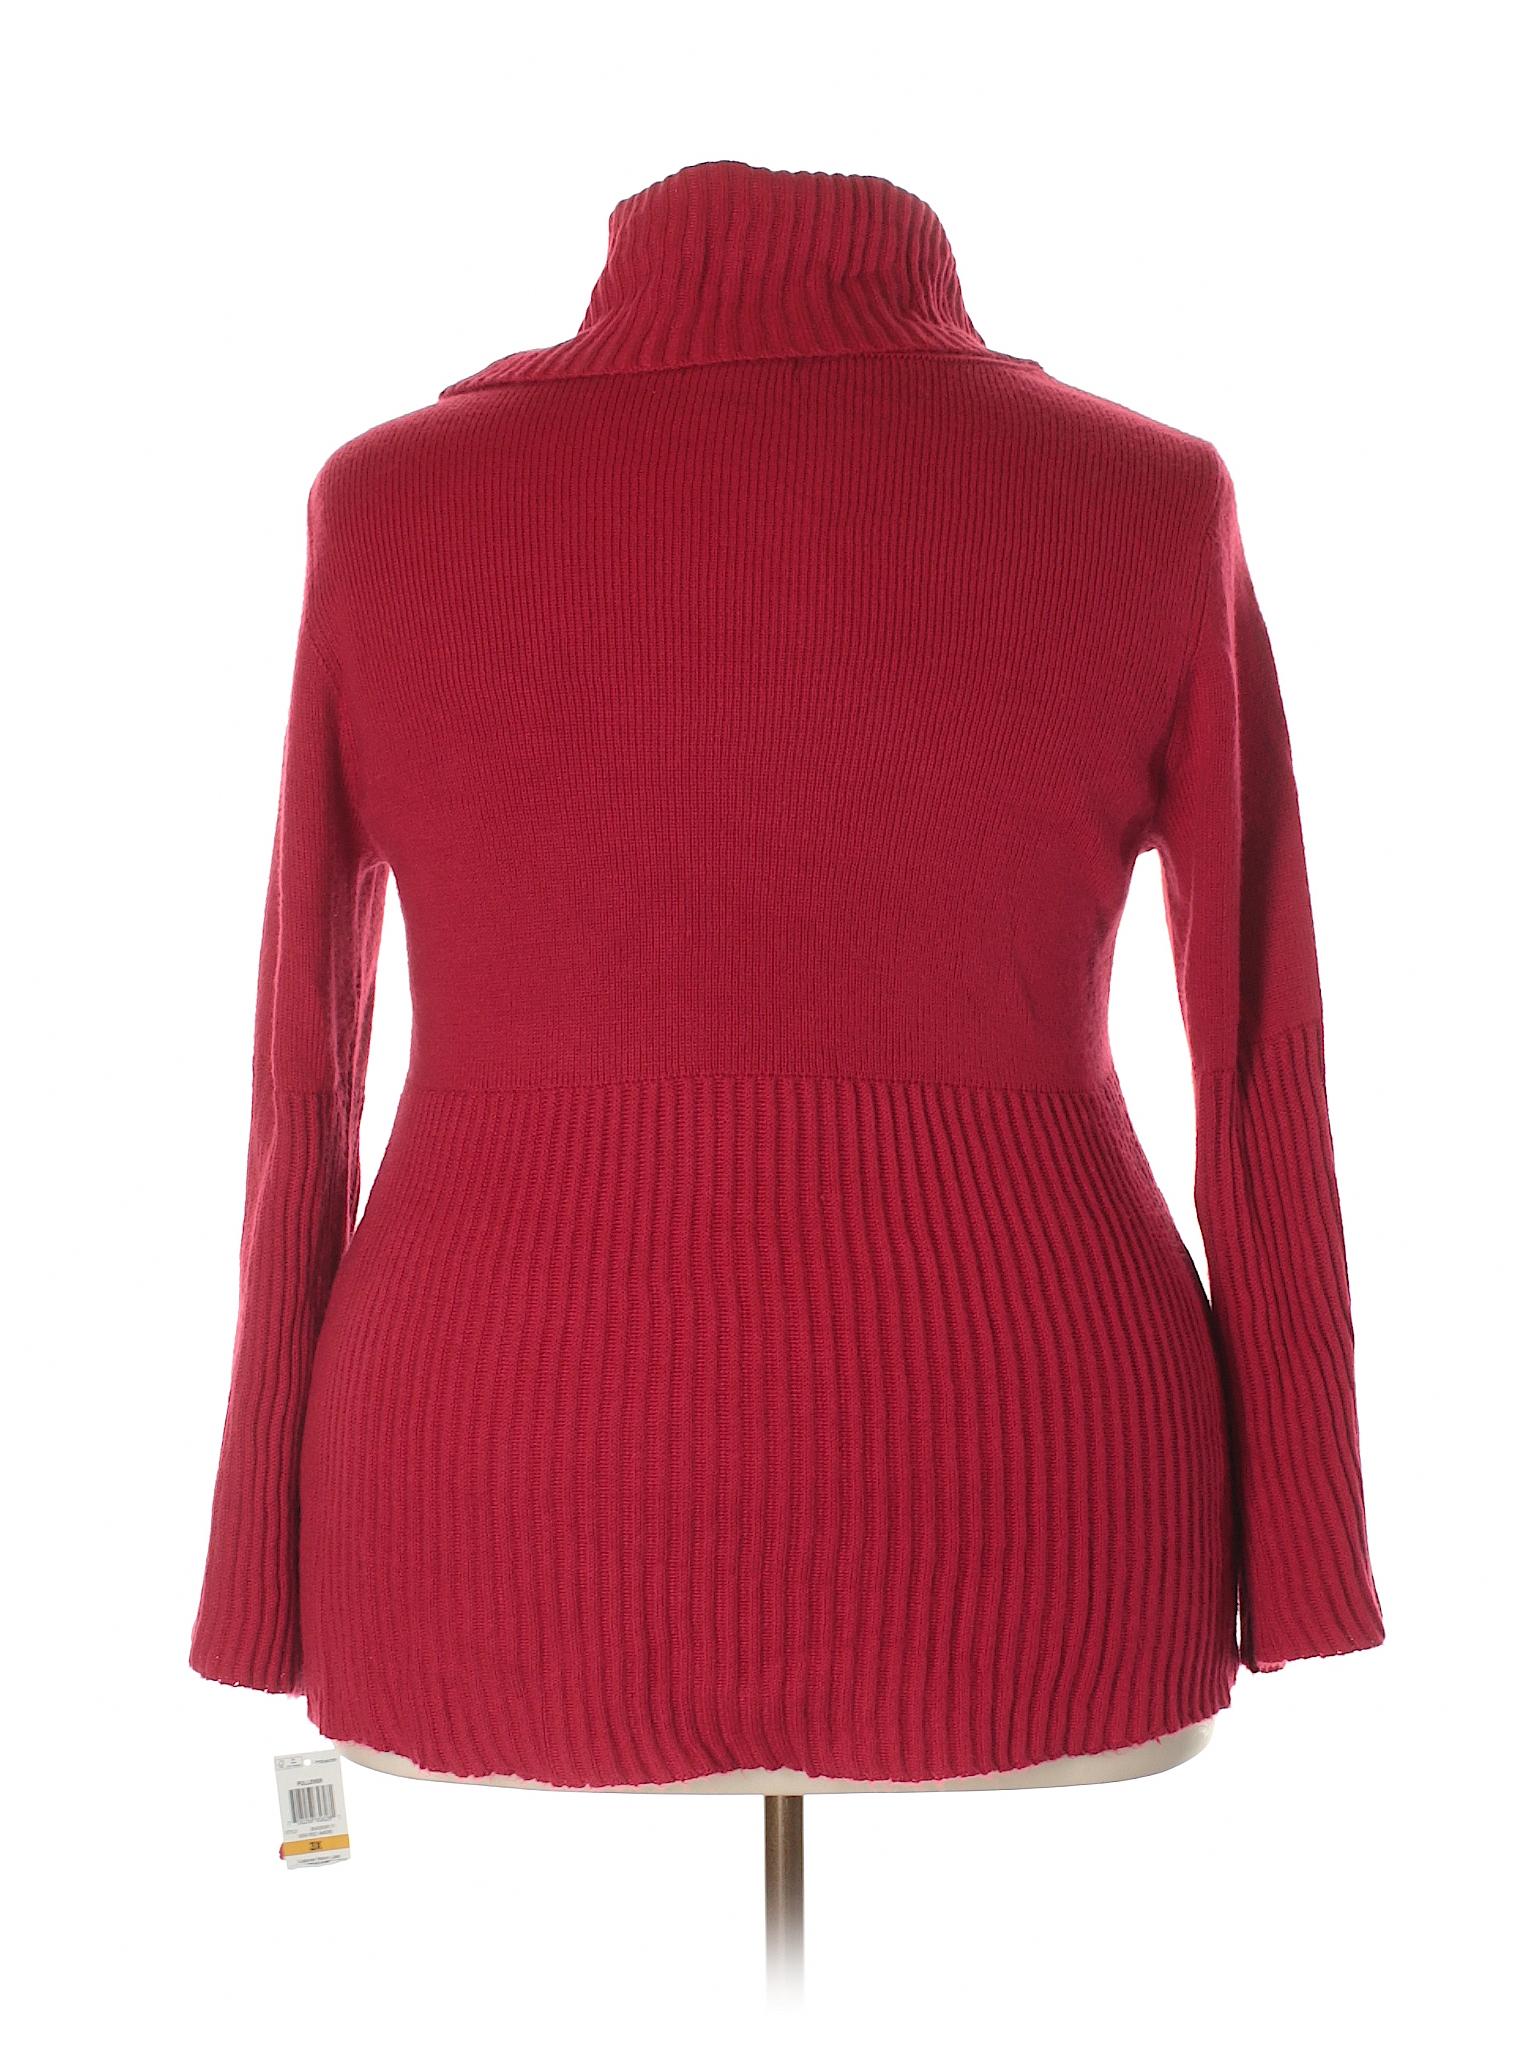 Boutique Pullover amp;Co Style Sweater Boutique Style TZCpwq0